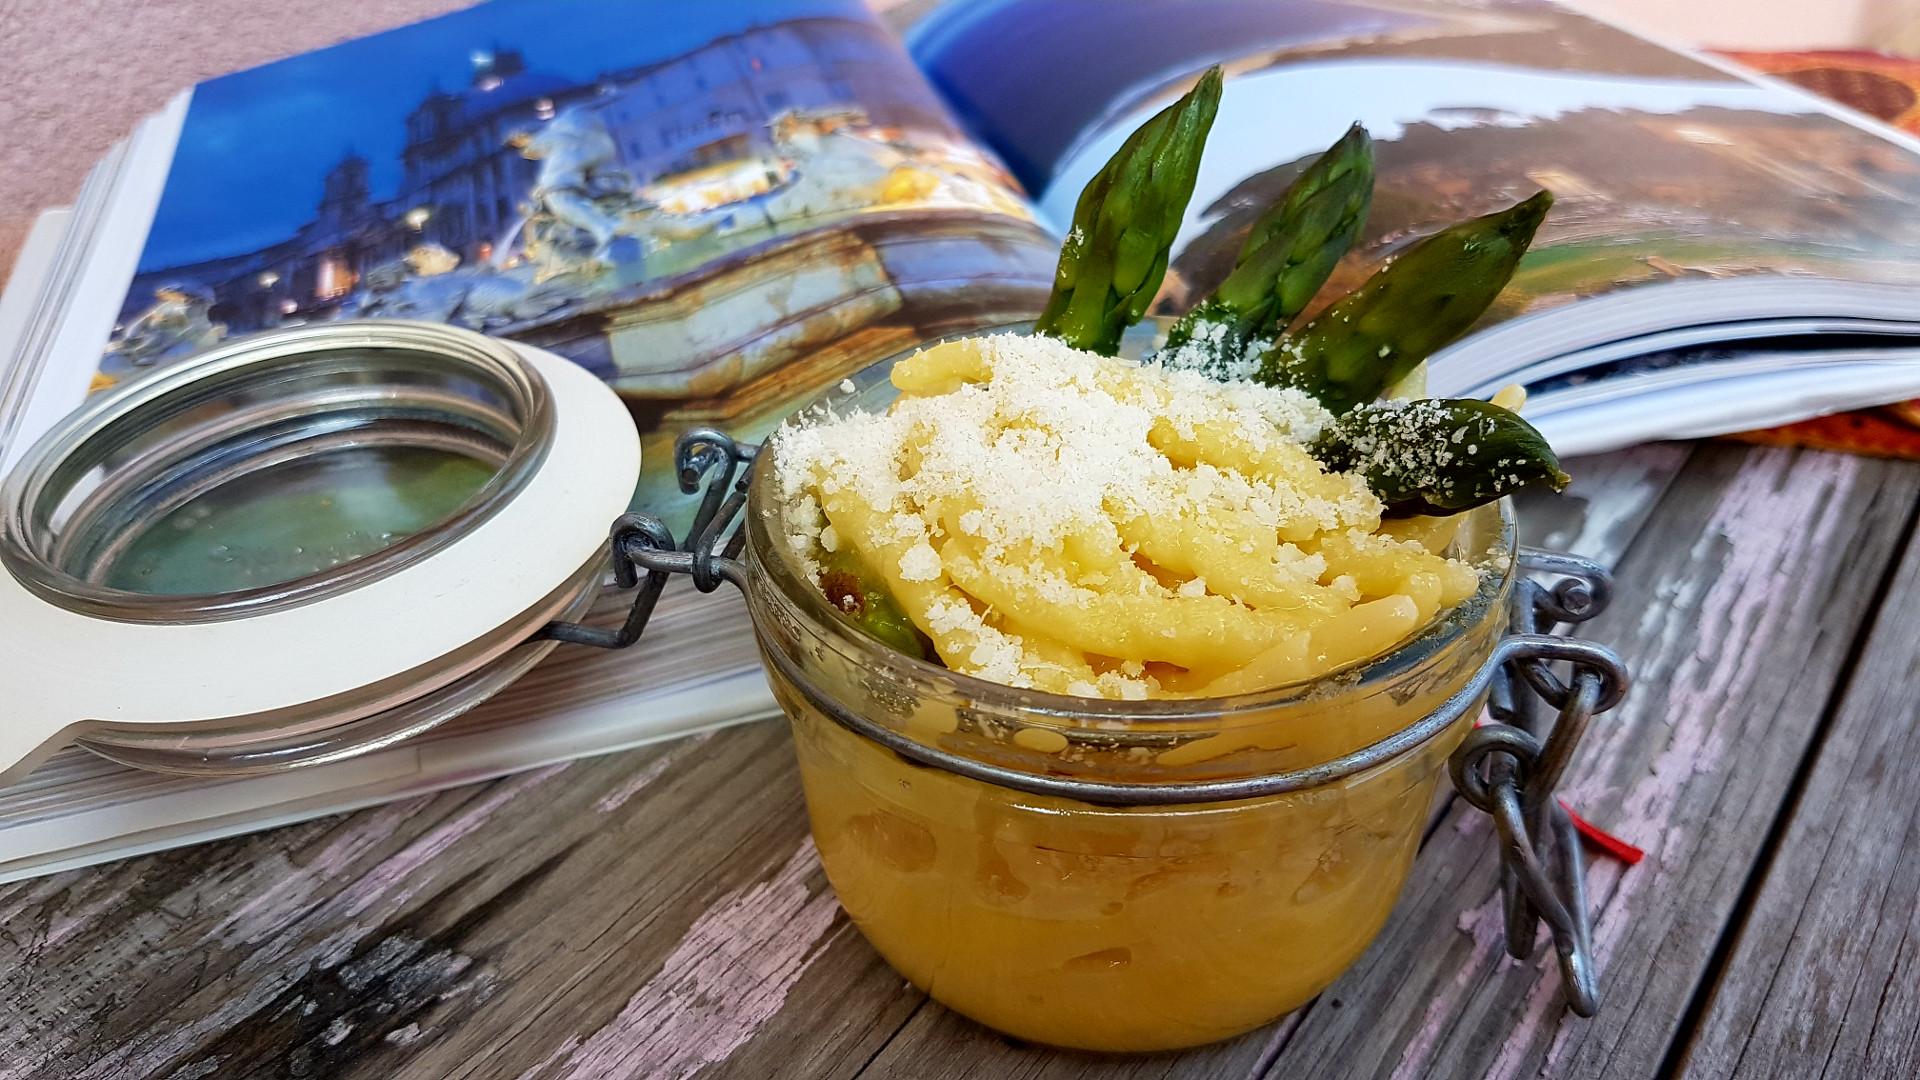 Carbonara con asparagi e le 3 regole per le uova